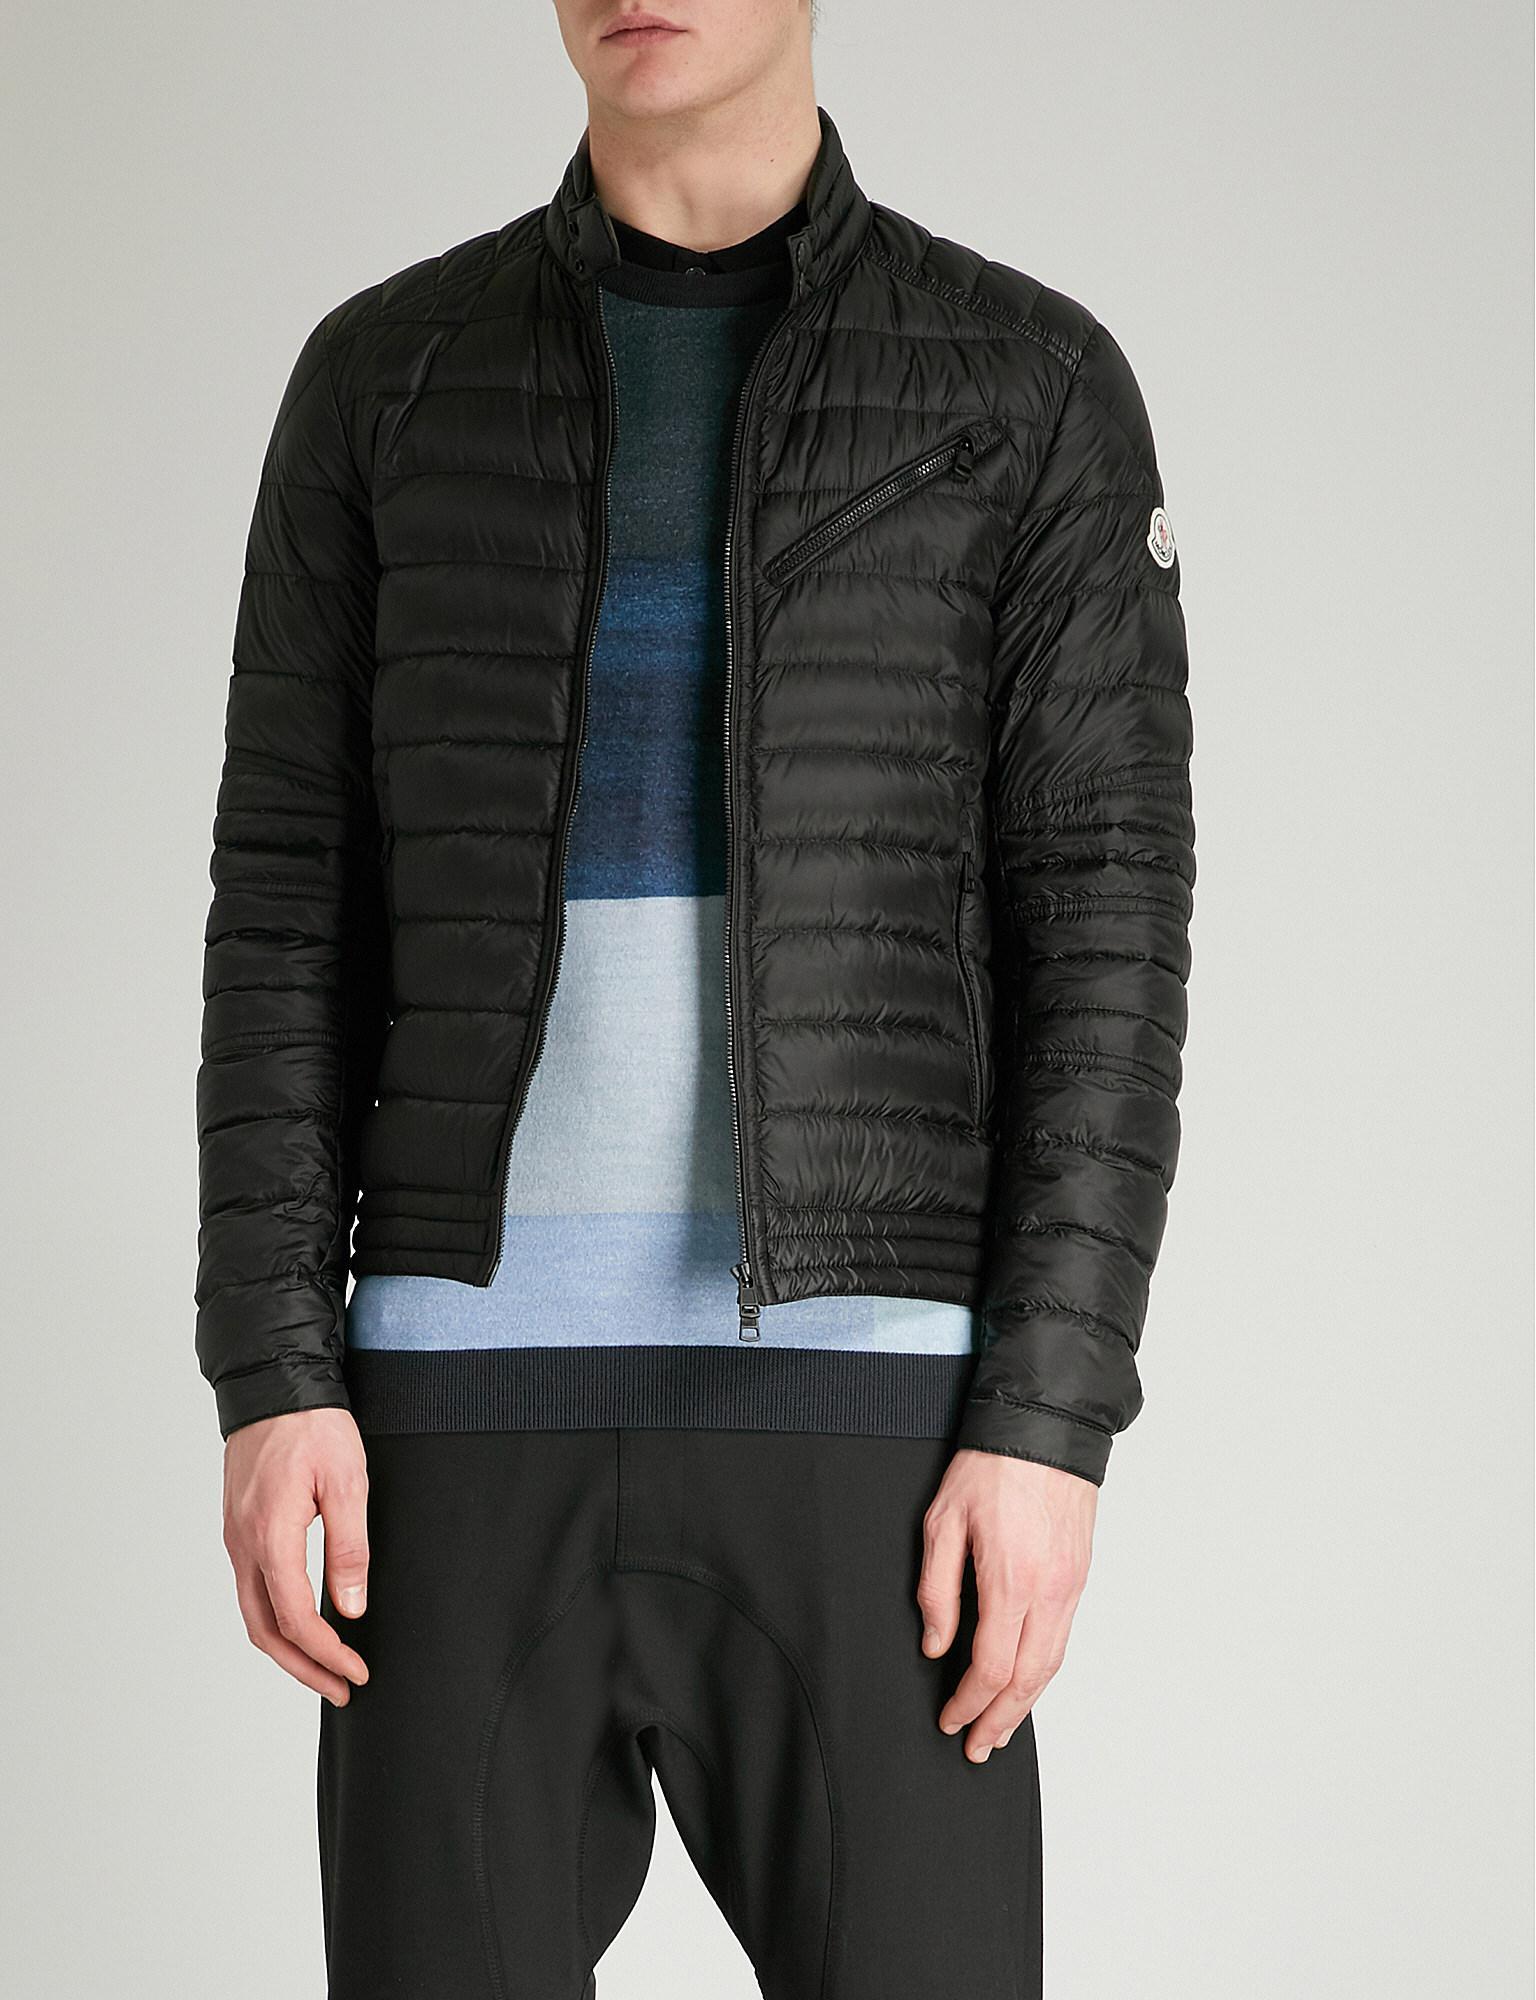 83abff5d5 Moncler Royat Quilted Shell-down Biker Jacket in Black for Men - Lyst